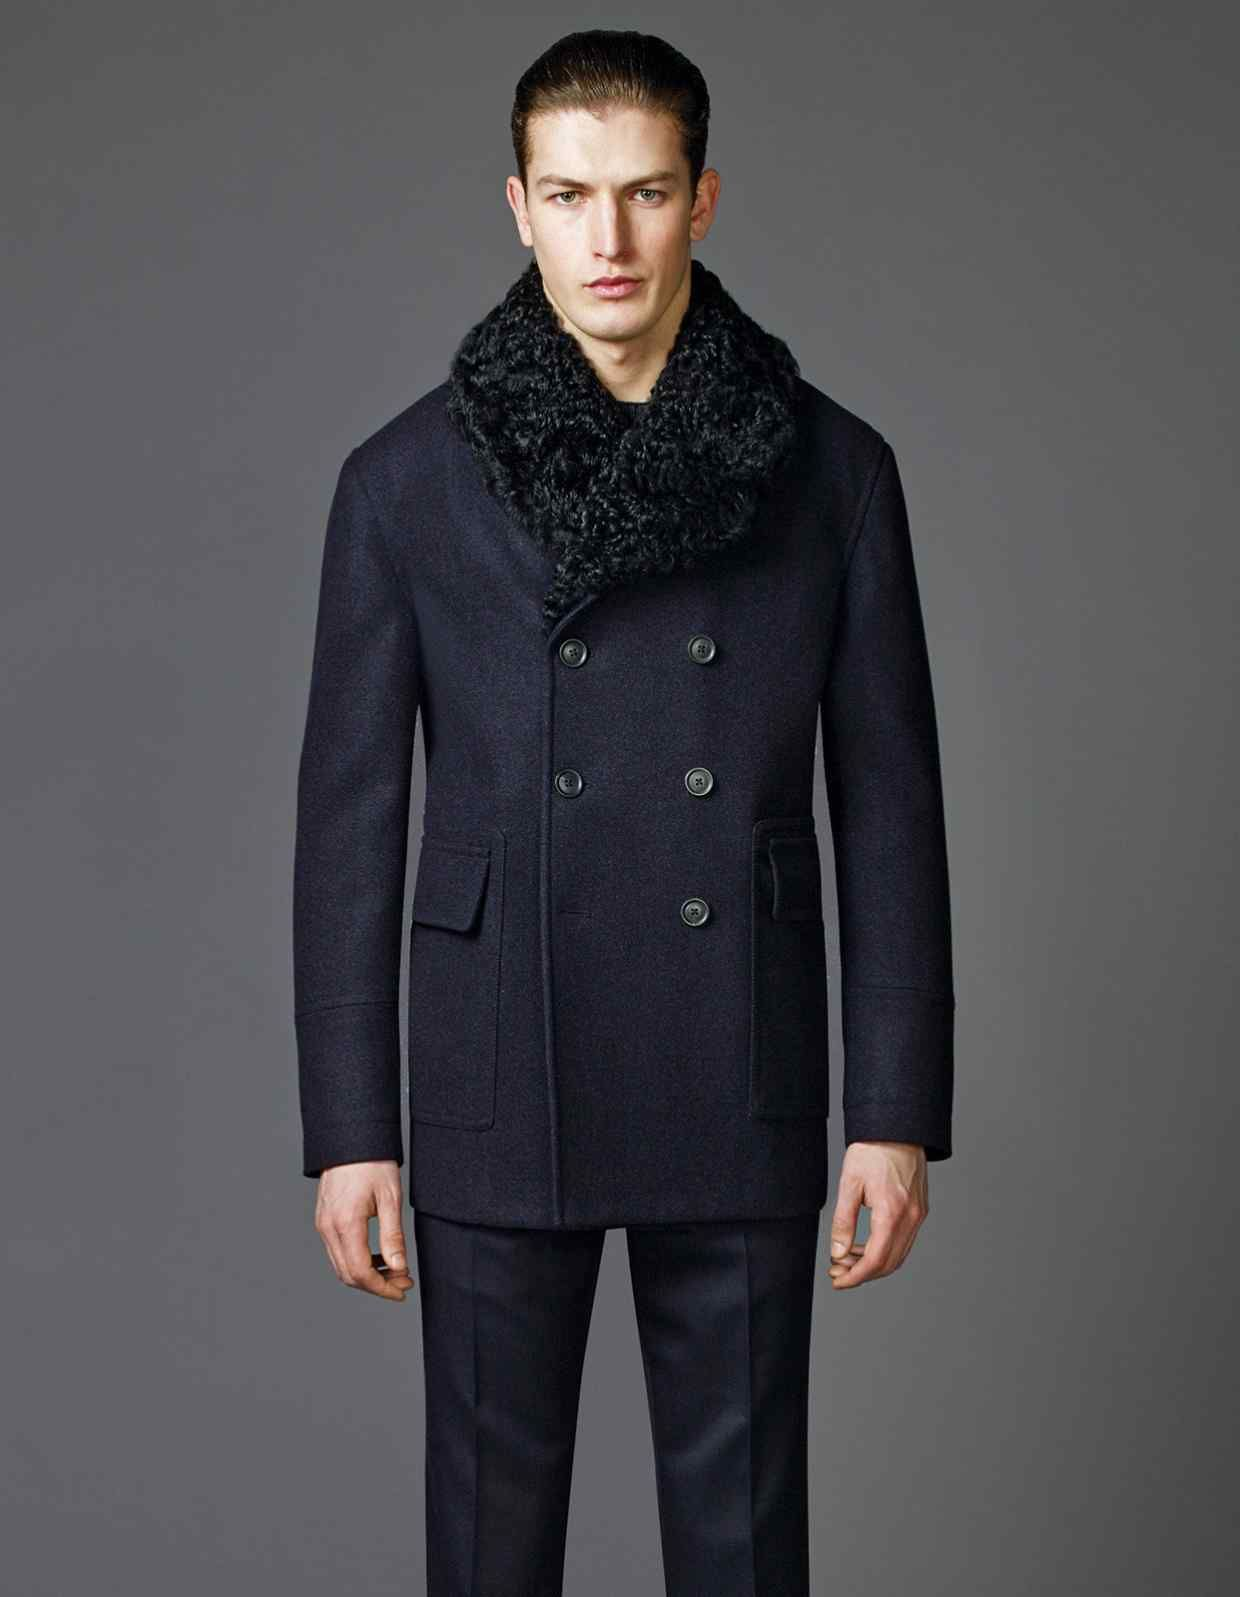 2d053b07dd1 New Winter Men Wool Black Windbreaker Fur Shearling Double-Breasted Pea Coat  Product Details  Material   Wool Moon light Fur Collar Color  Black Front   ...